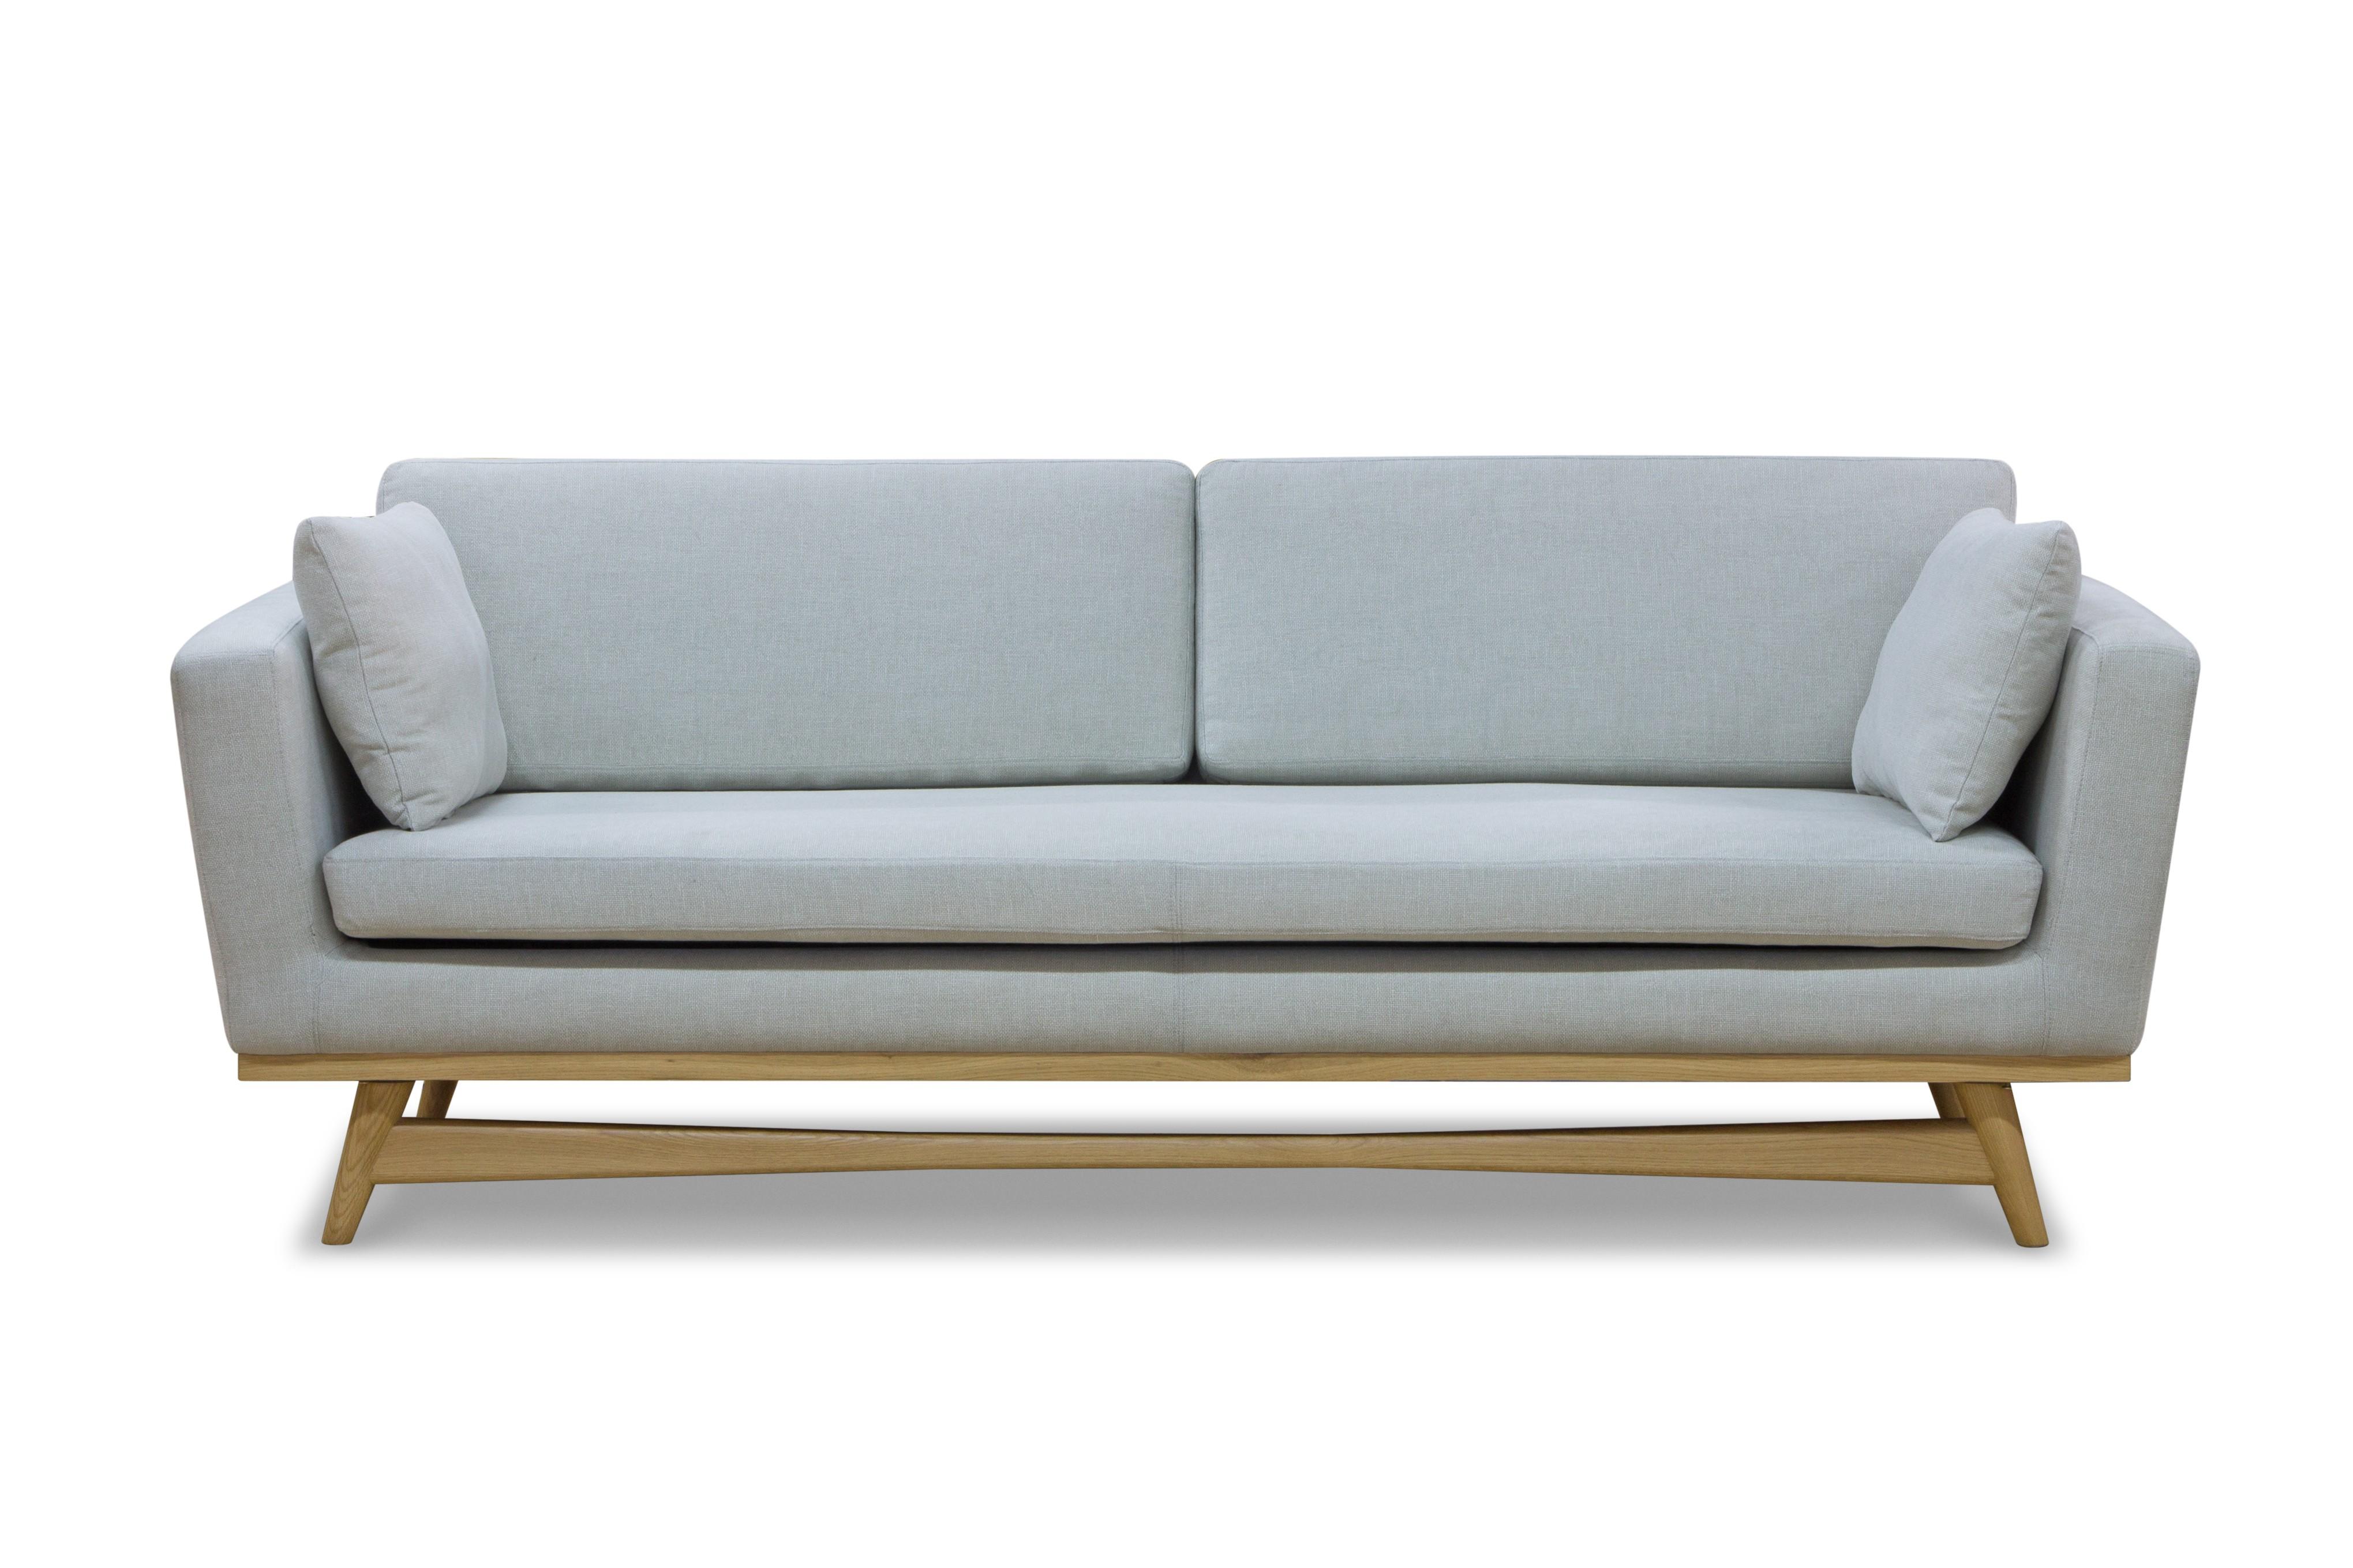 canape fifties 210cm coton craie de red edition. Black Bedroom Furniture Sets. Home Design Ideas